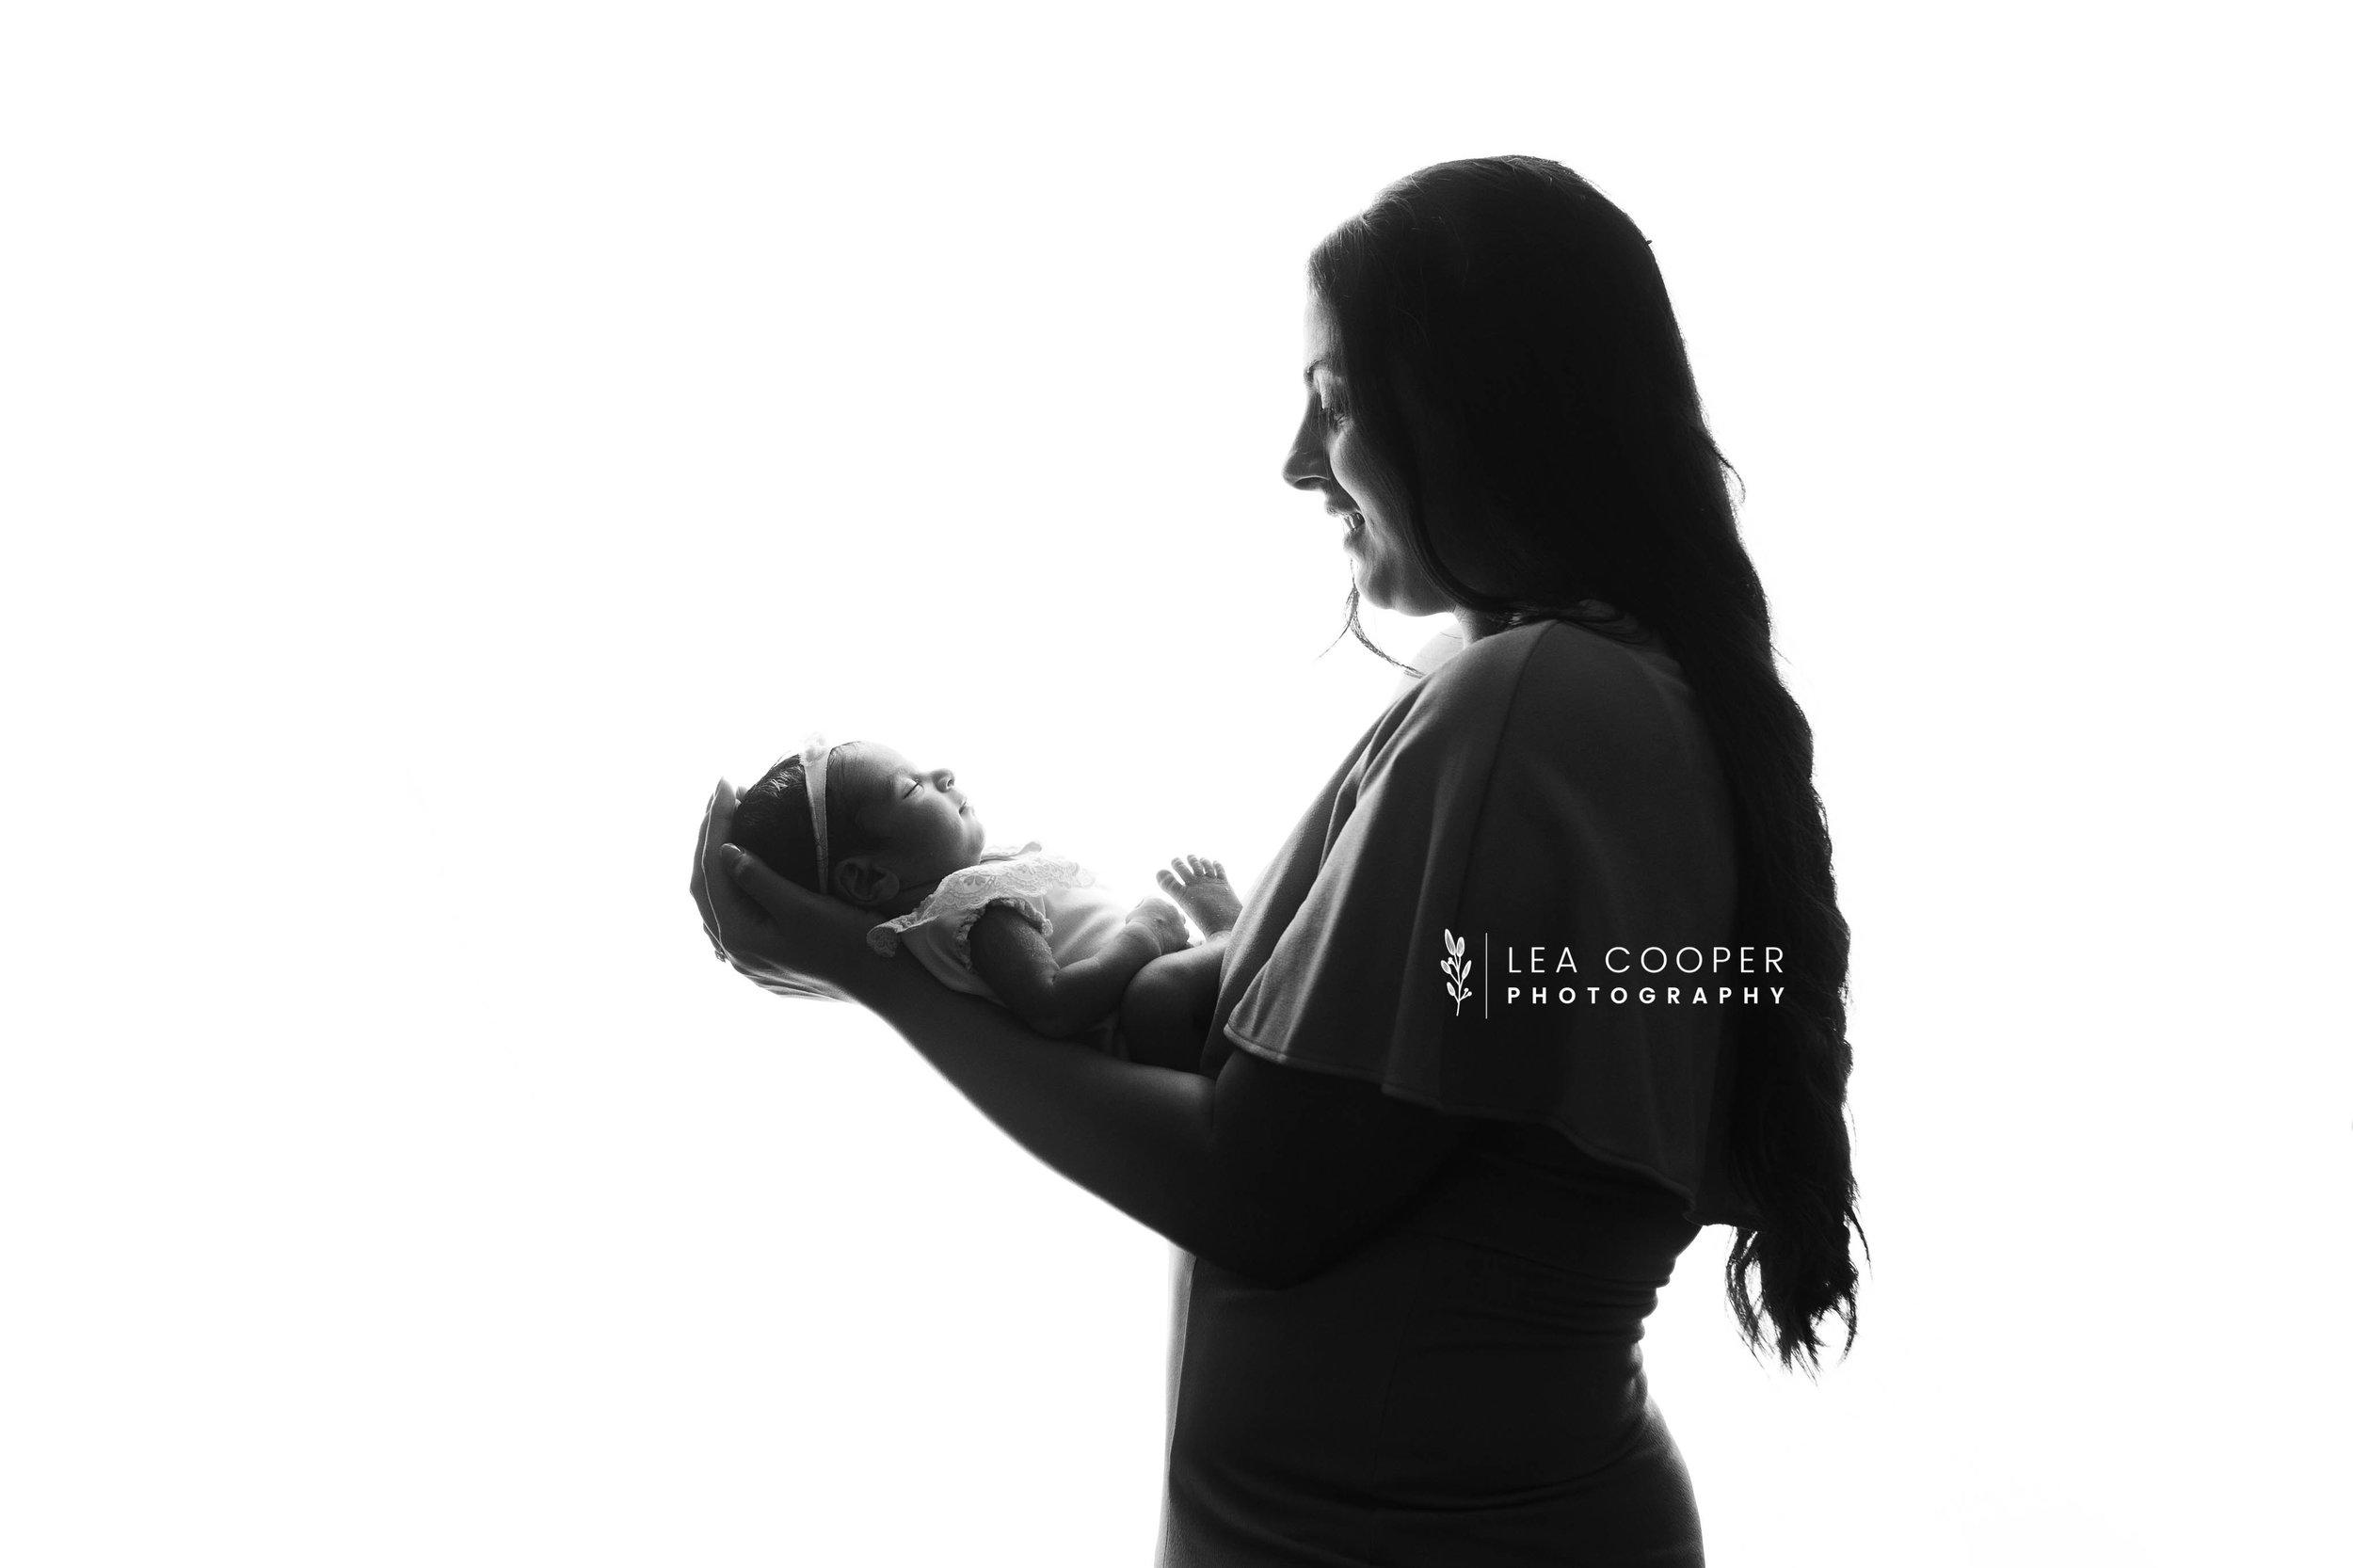 LEA-COOPER-PHOTOGRAPHY-NEWBORN-PHOTOGRAPHER-BABY-PHOTOGRAPHY-NEWBORN-SESSION-WILLENHALL-WOLVERHAMPTON-WEST-MIDLANDS-UK-4.jpg